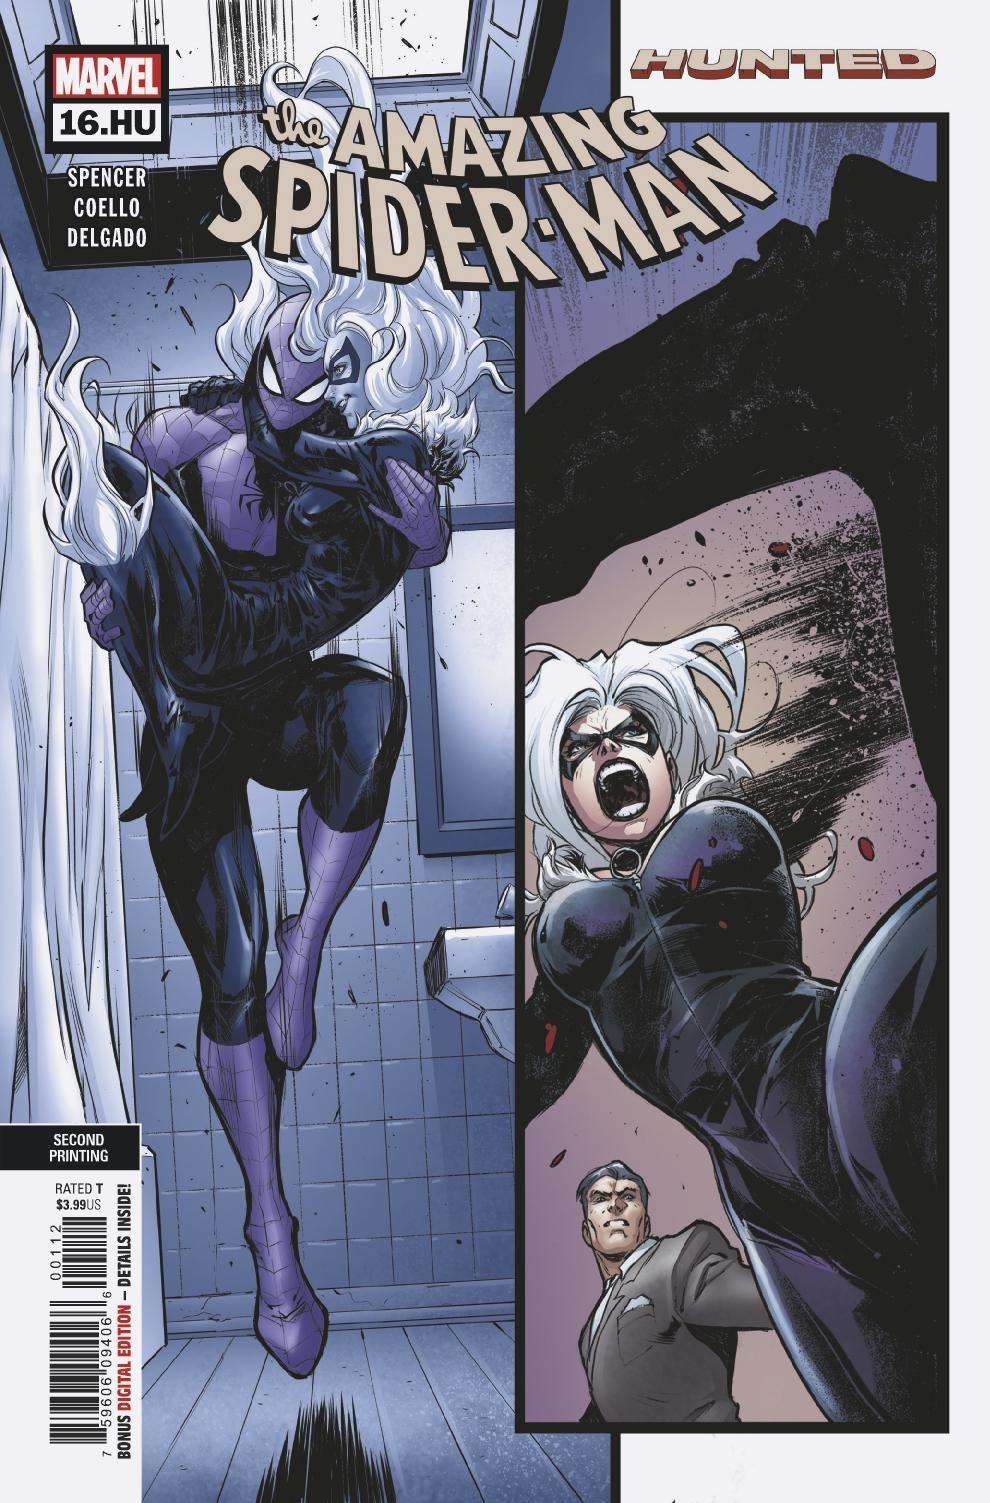 Amazing Spider-Man Vol 5 16.HU Second Printing Variant.jpg